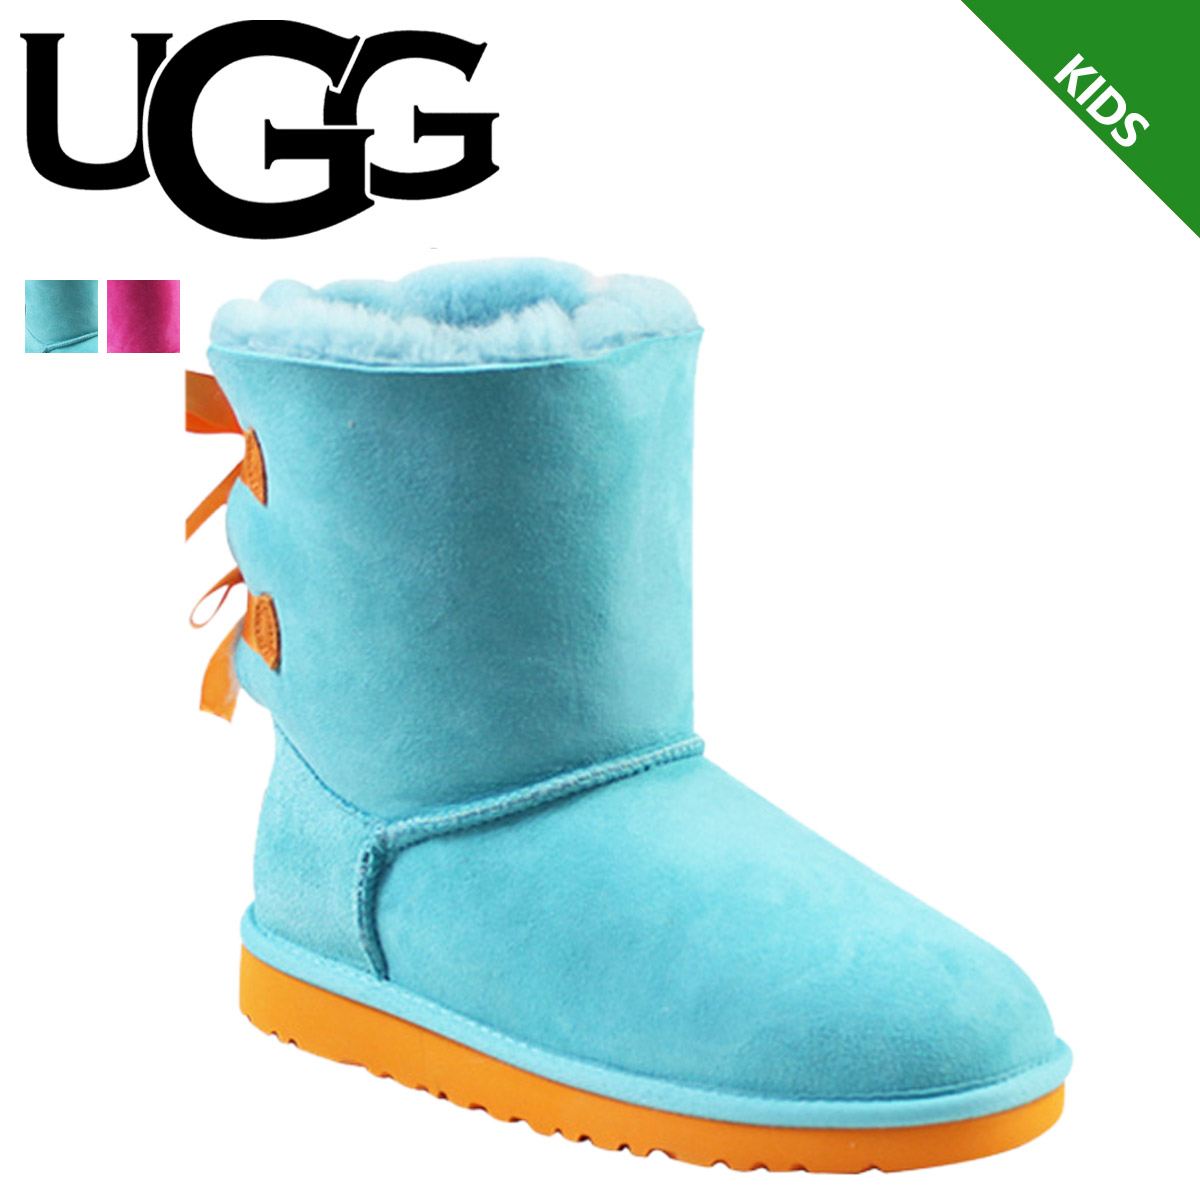 UGG UGG kids Bailey bow boots KIDS BAILEY BOW 3280KK 3280YK Sheepskin ladies